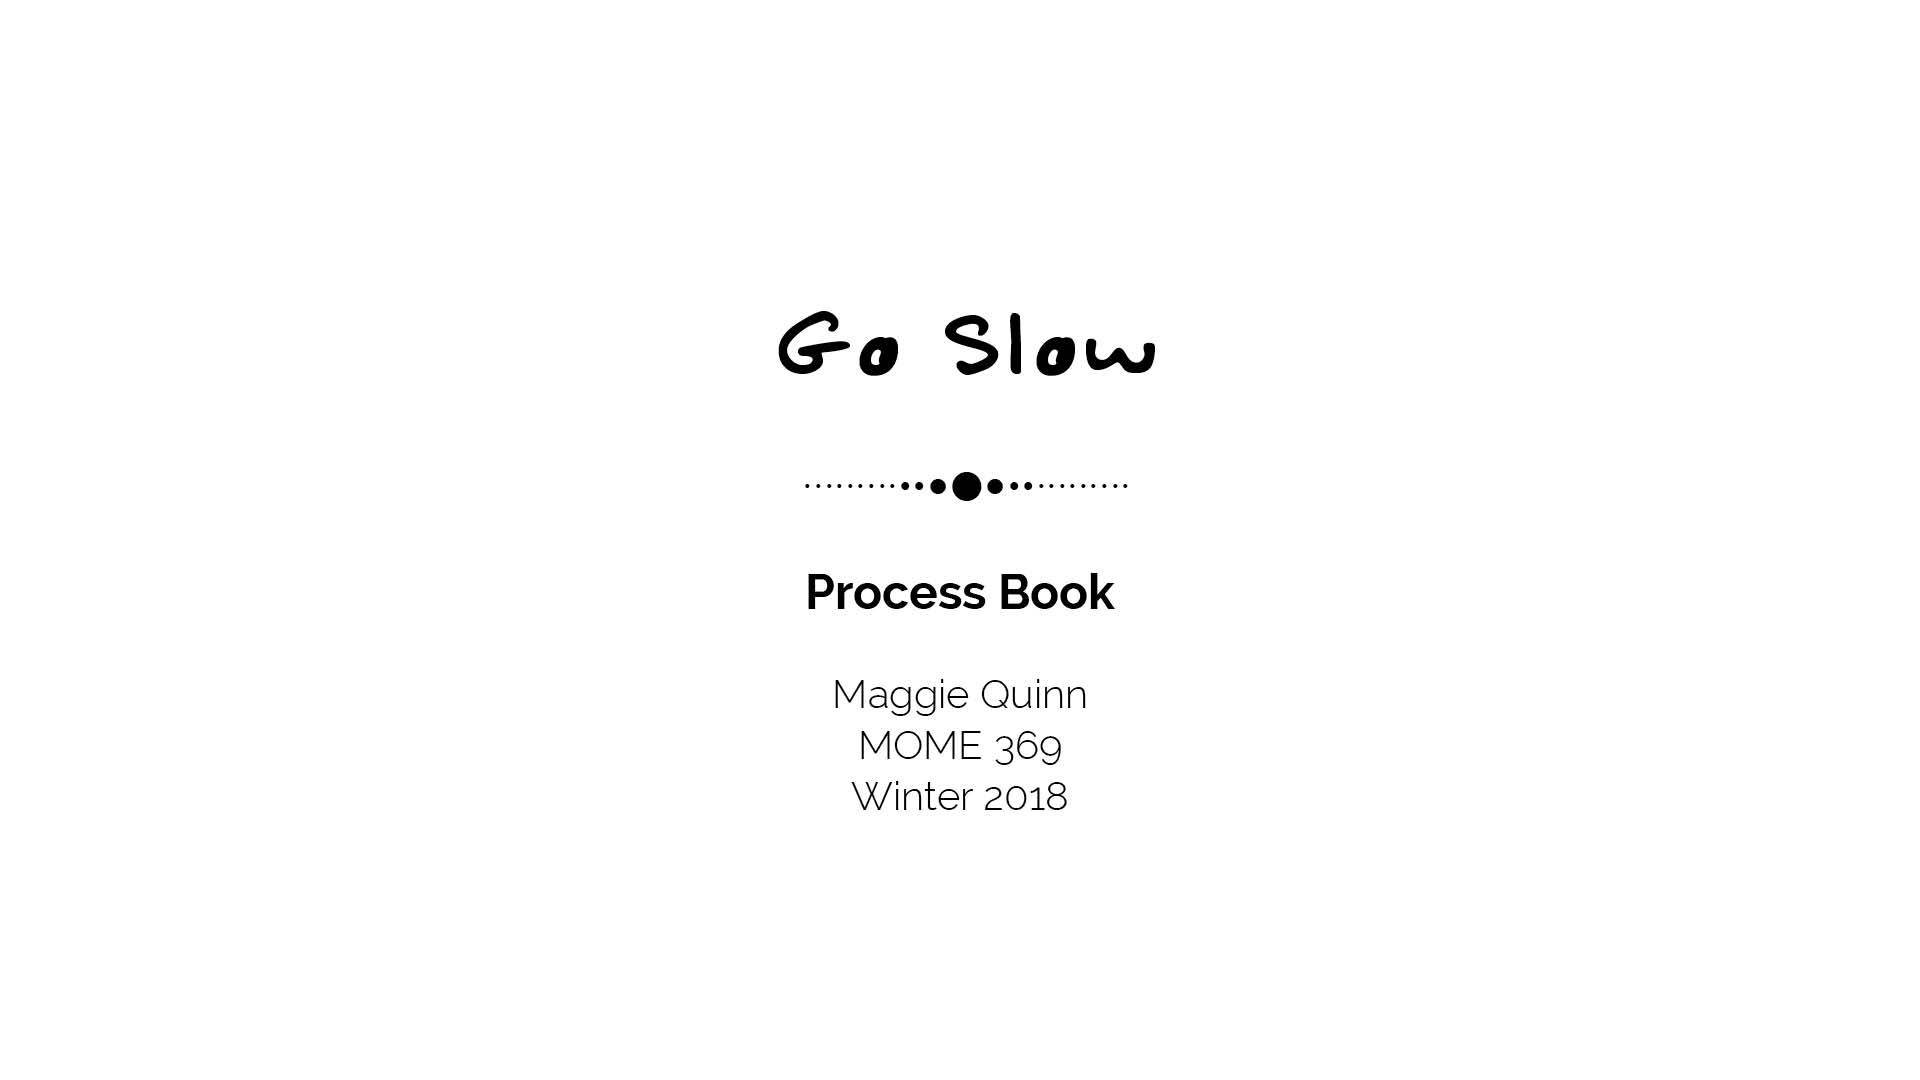 Go Slow process book 19.jpg